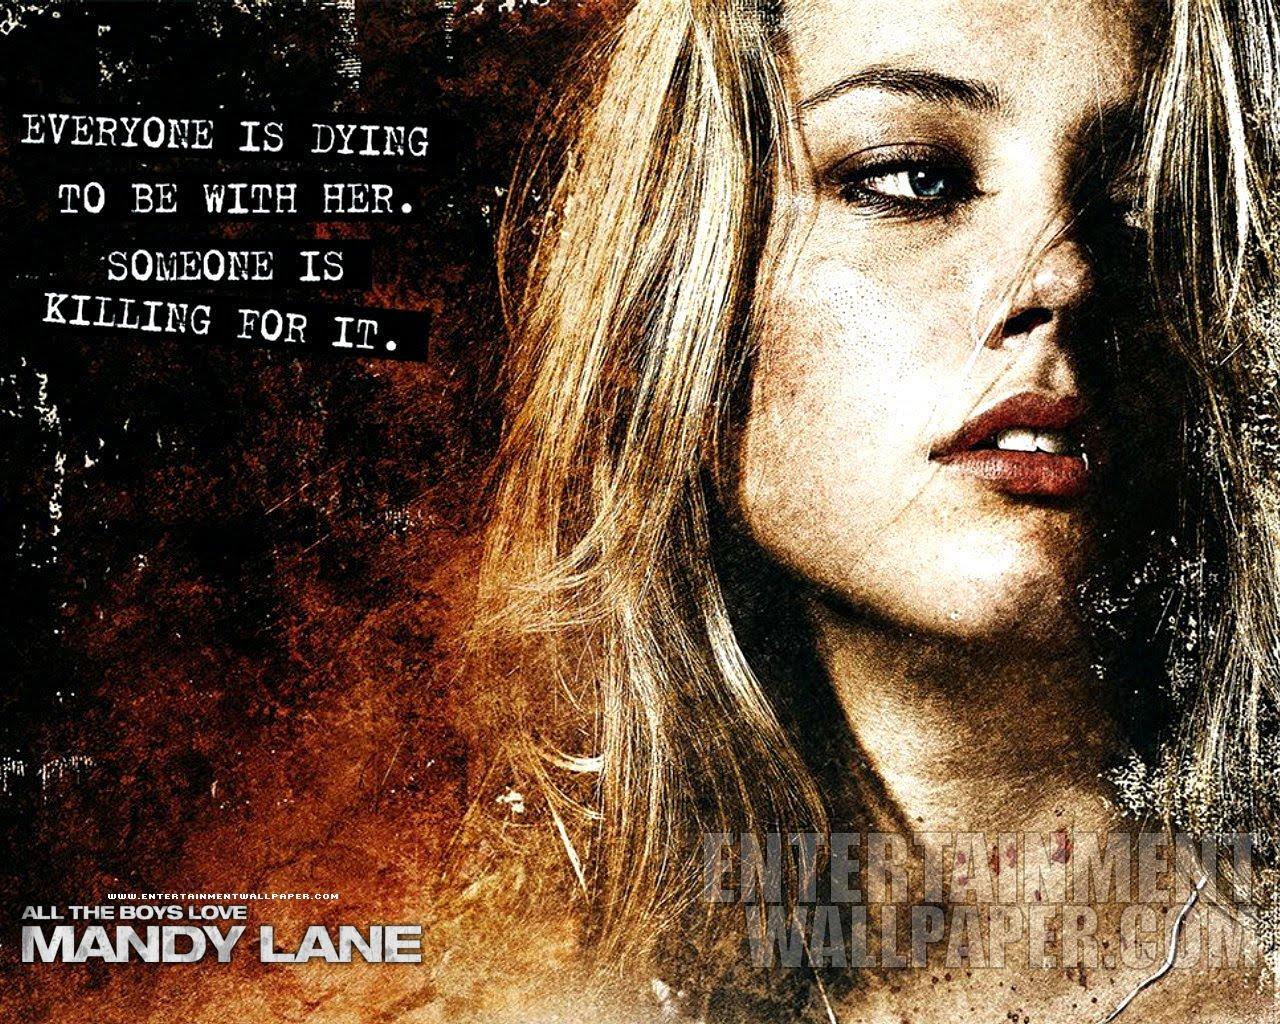 http://1.bp.blogspot.com/_w67fDzQGVRI/TEajAI6AsYI/AAAAAAAAAtY/NR7TbN2REJQ/s1600/all_the_boys_love_mandy_lane02.jpg